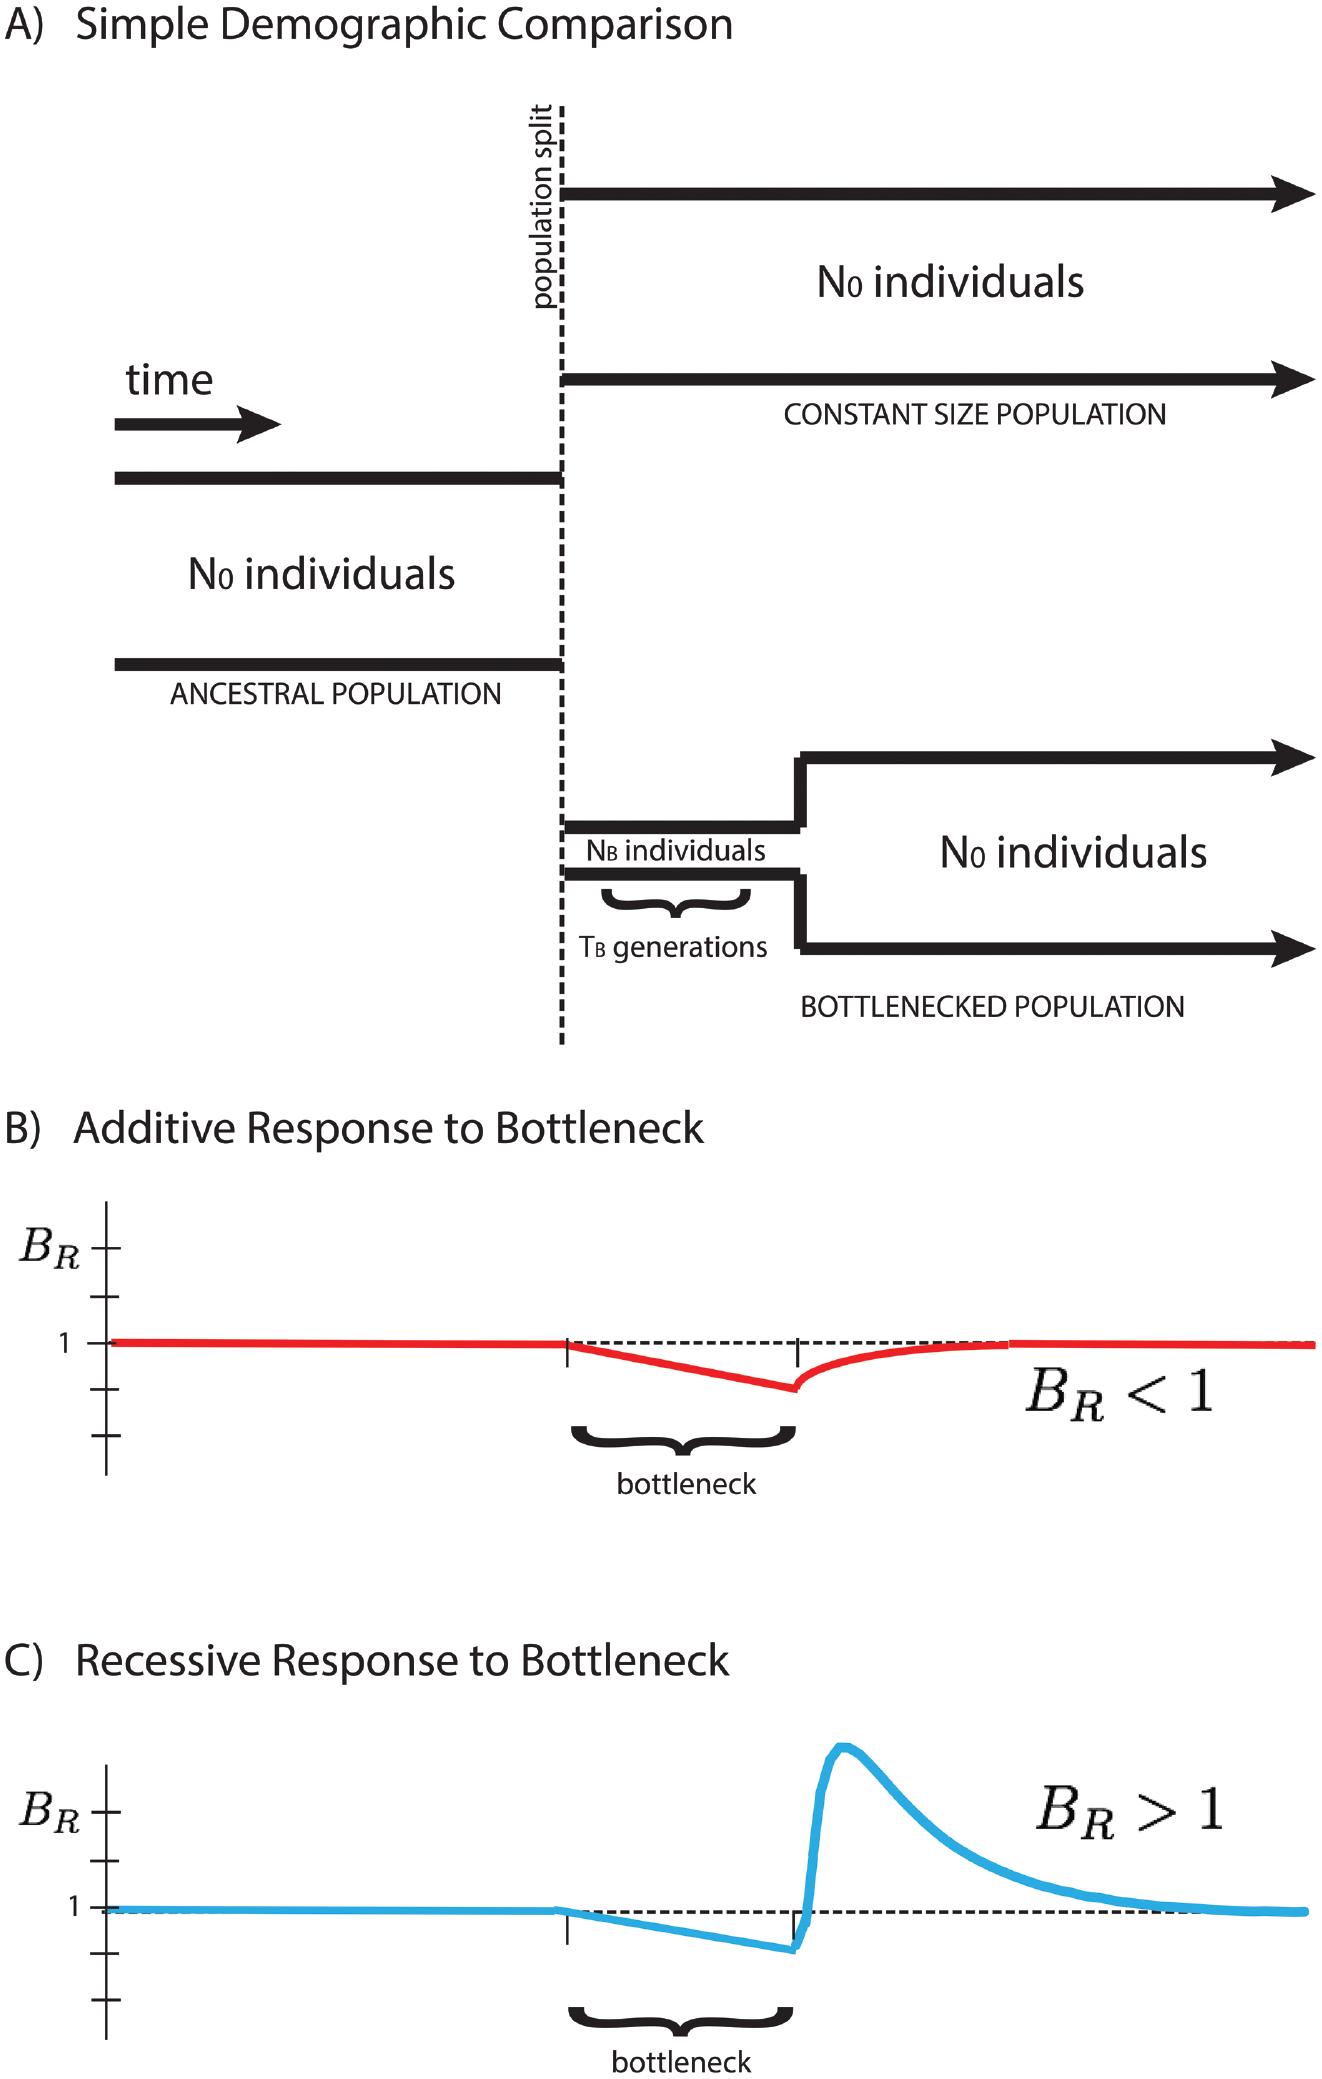 Response of the <i>B</i><sub><i>R</i></sub> statistic for additive and recessive variation.